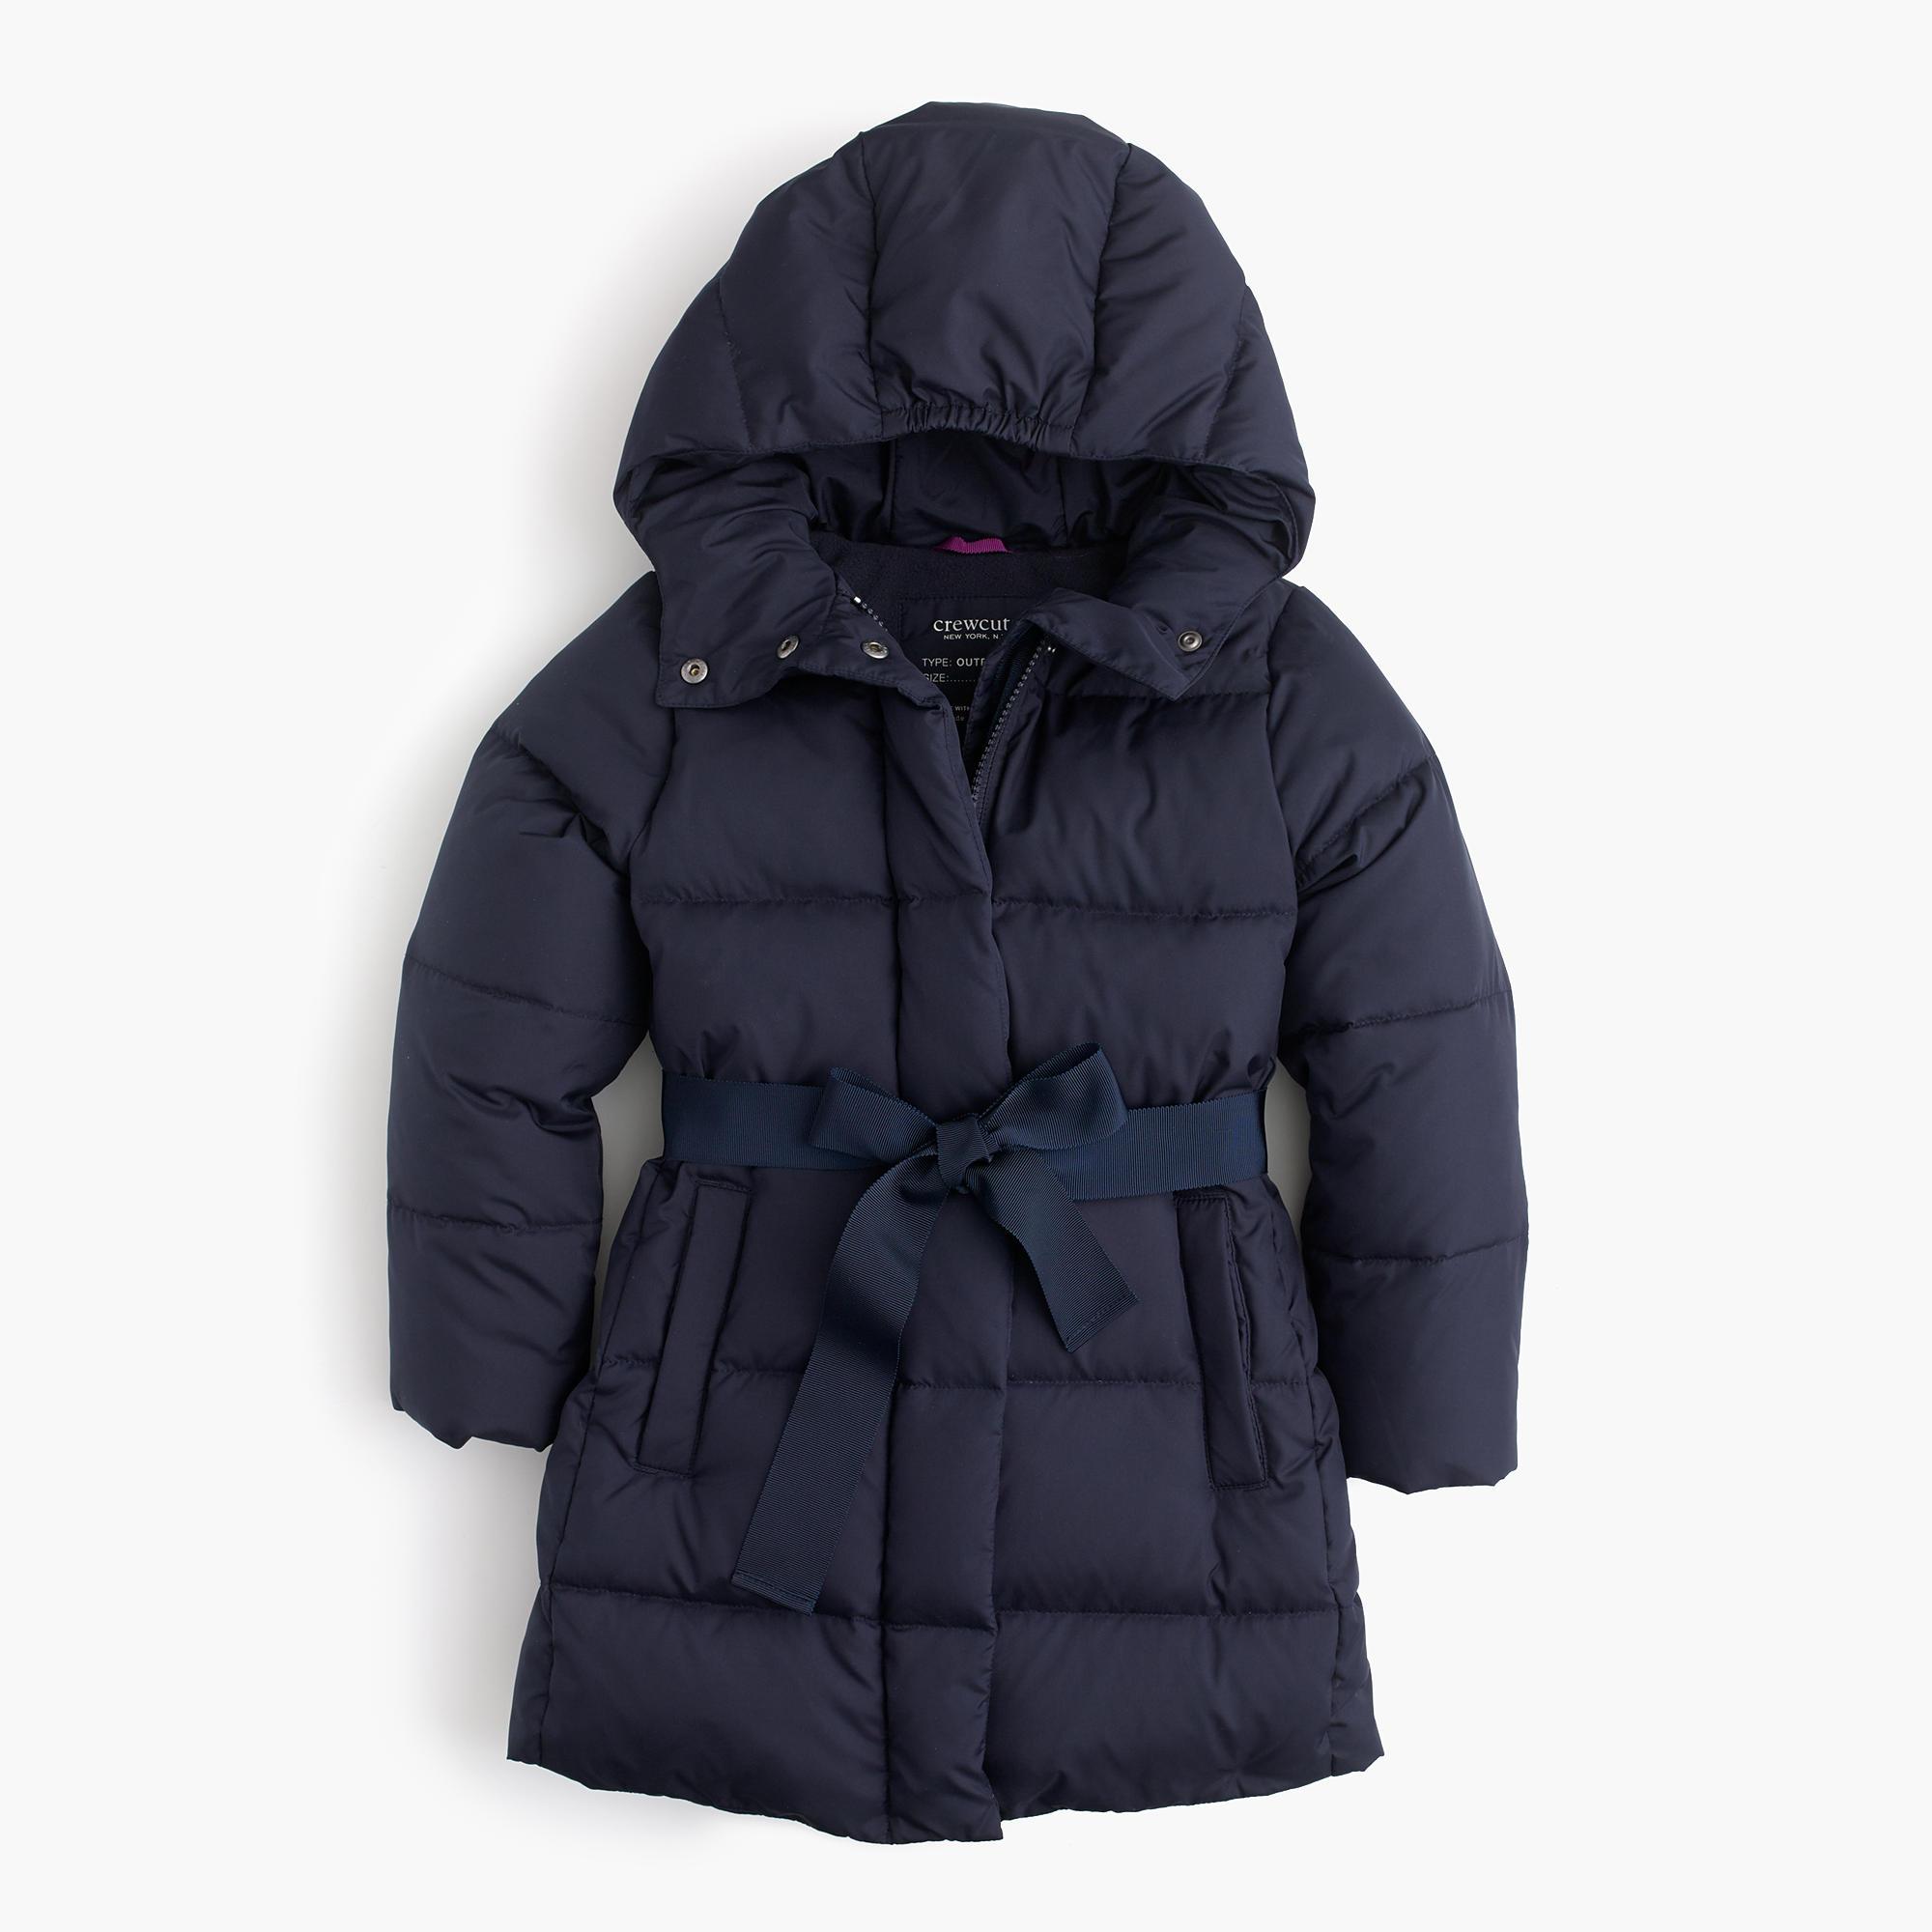 Girls' Tie-Front Puffer Jacket : Girls' Jackets & Coats | J.Crew